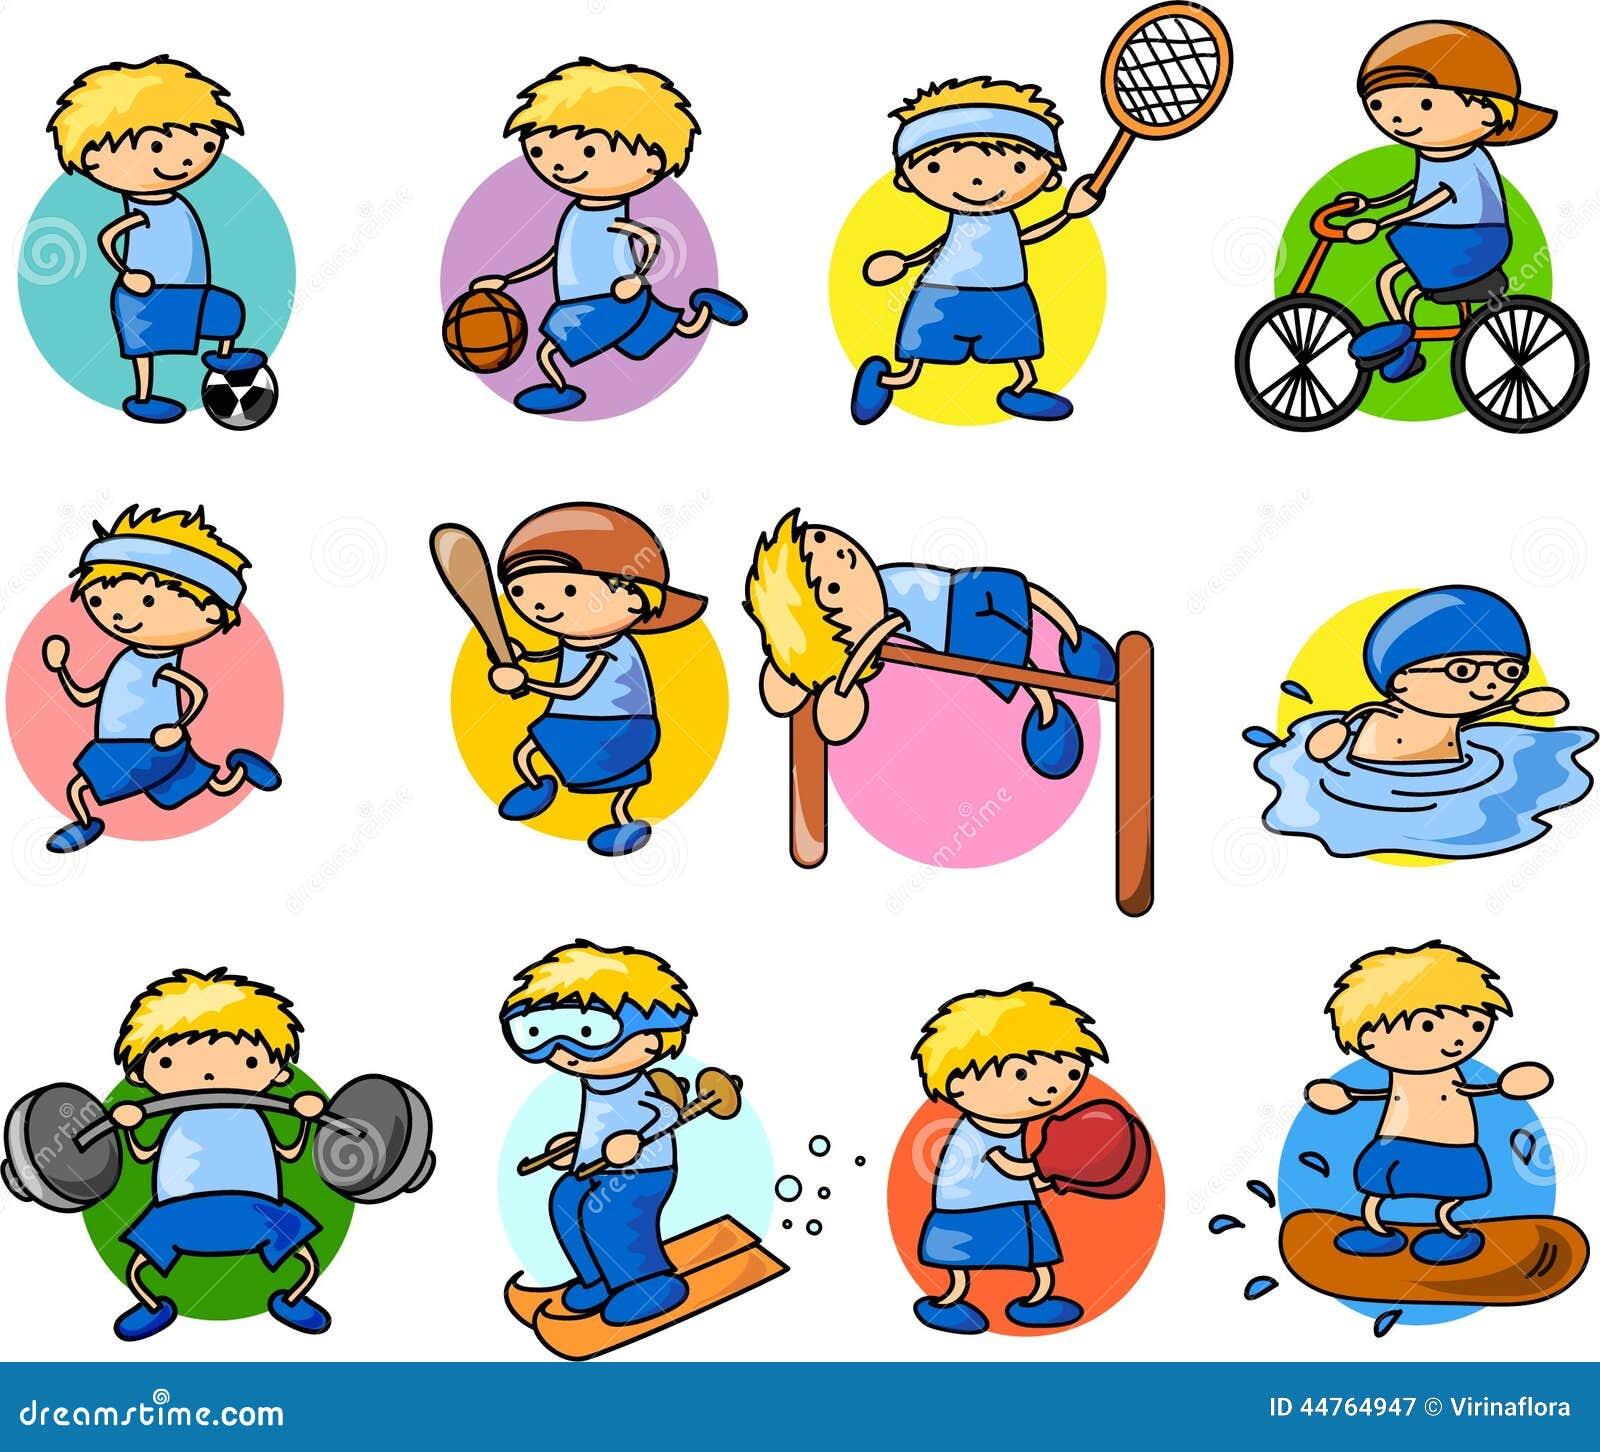 cartoon sport dibujos animados deporte icon pictogram icono vector het fumetto icona habilidades motrices tecknad stockillustratie deportes dibujo fotobehang pictogrammen